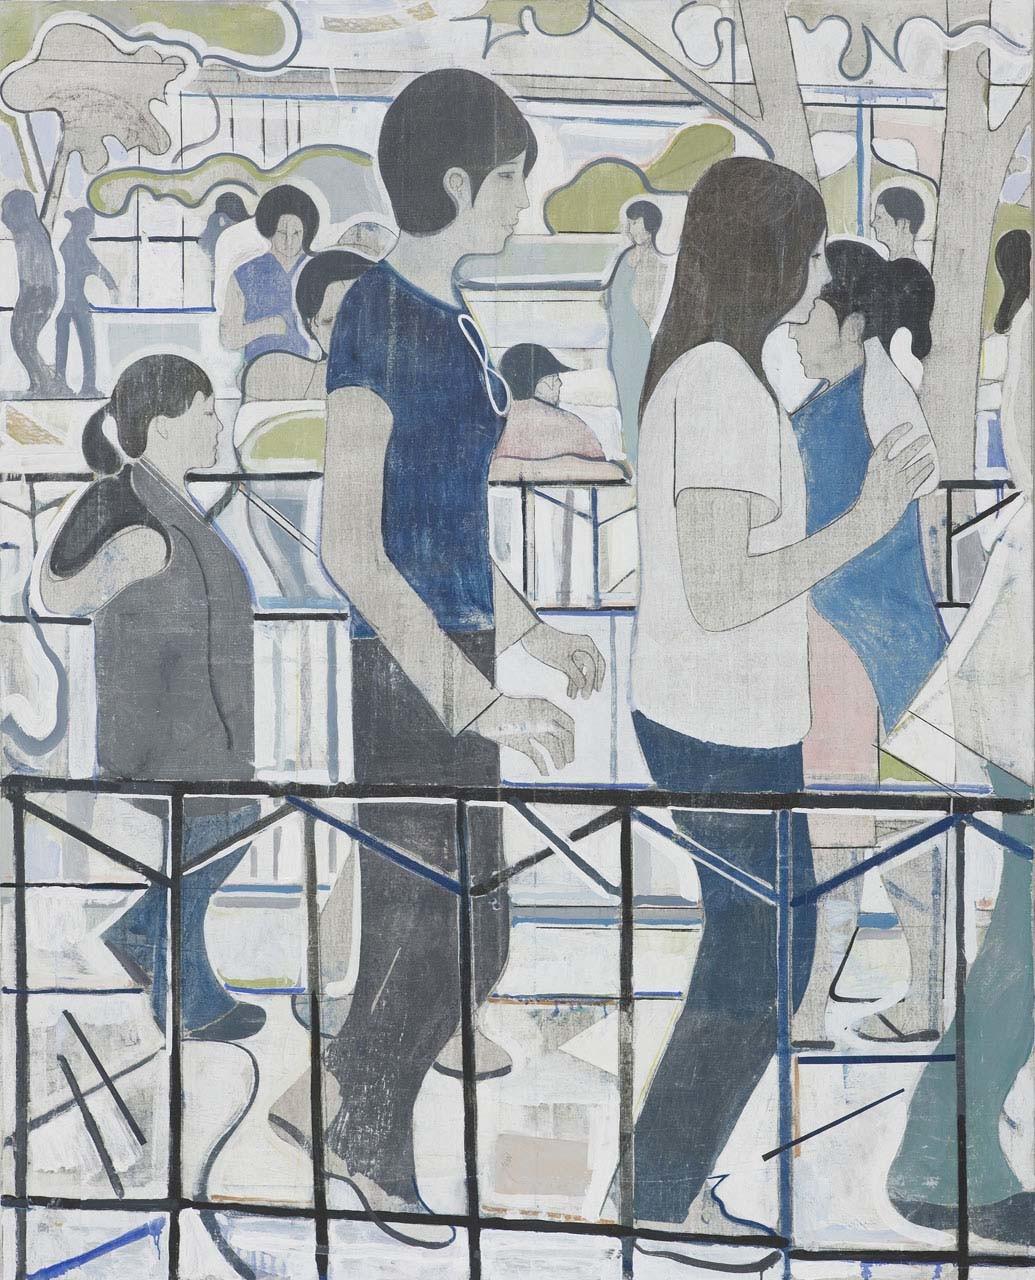 <p>Untitled (three women facing right), 2008</p>